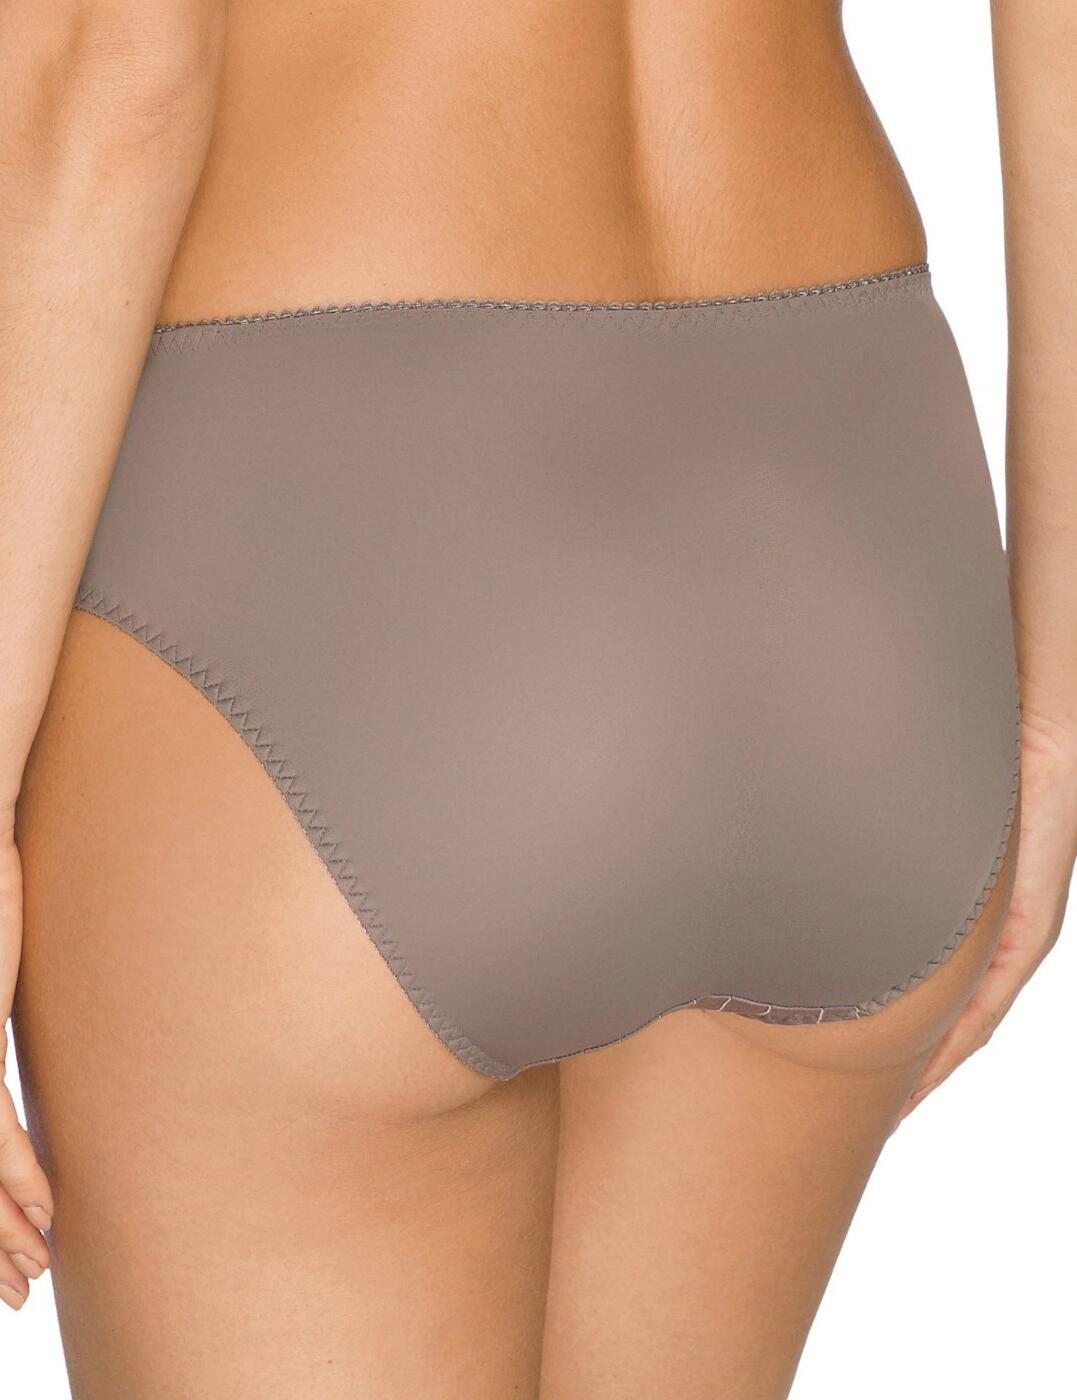 Prima-Donna-Deauville-Volle-Unterhose-Slip-Slips-Pant-0561811-Luxus-Dessous Indexbild 27